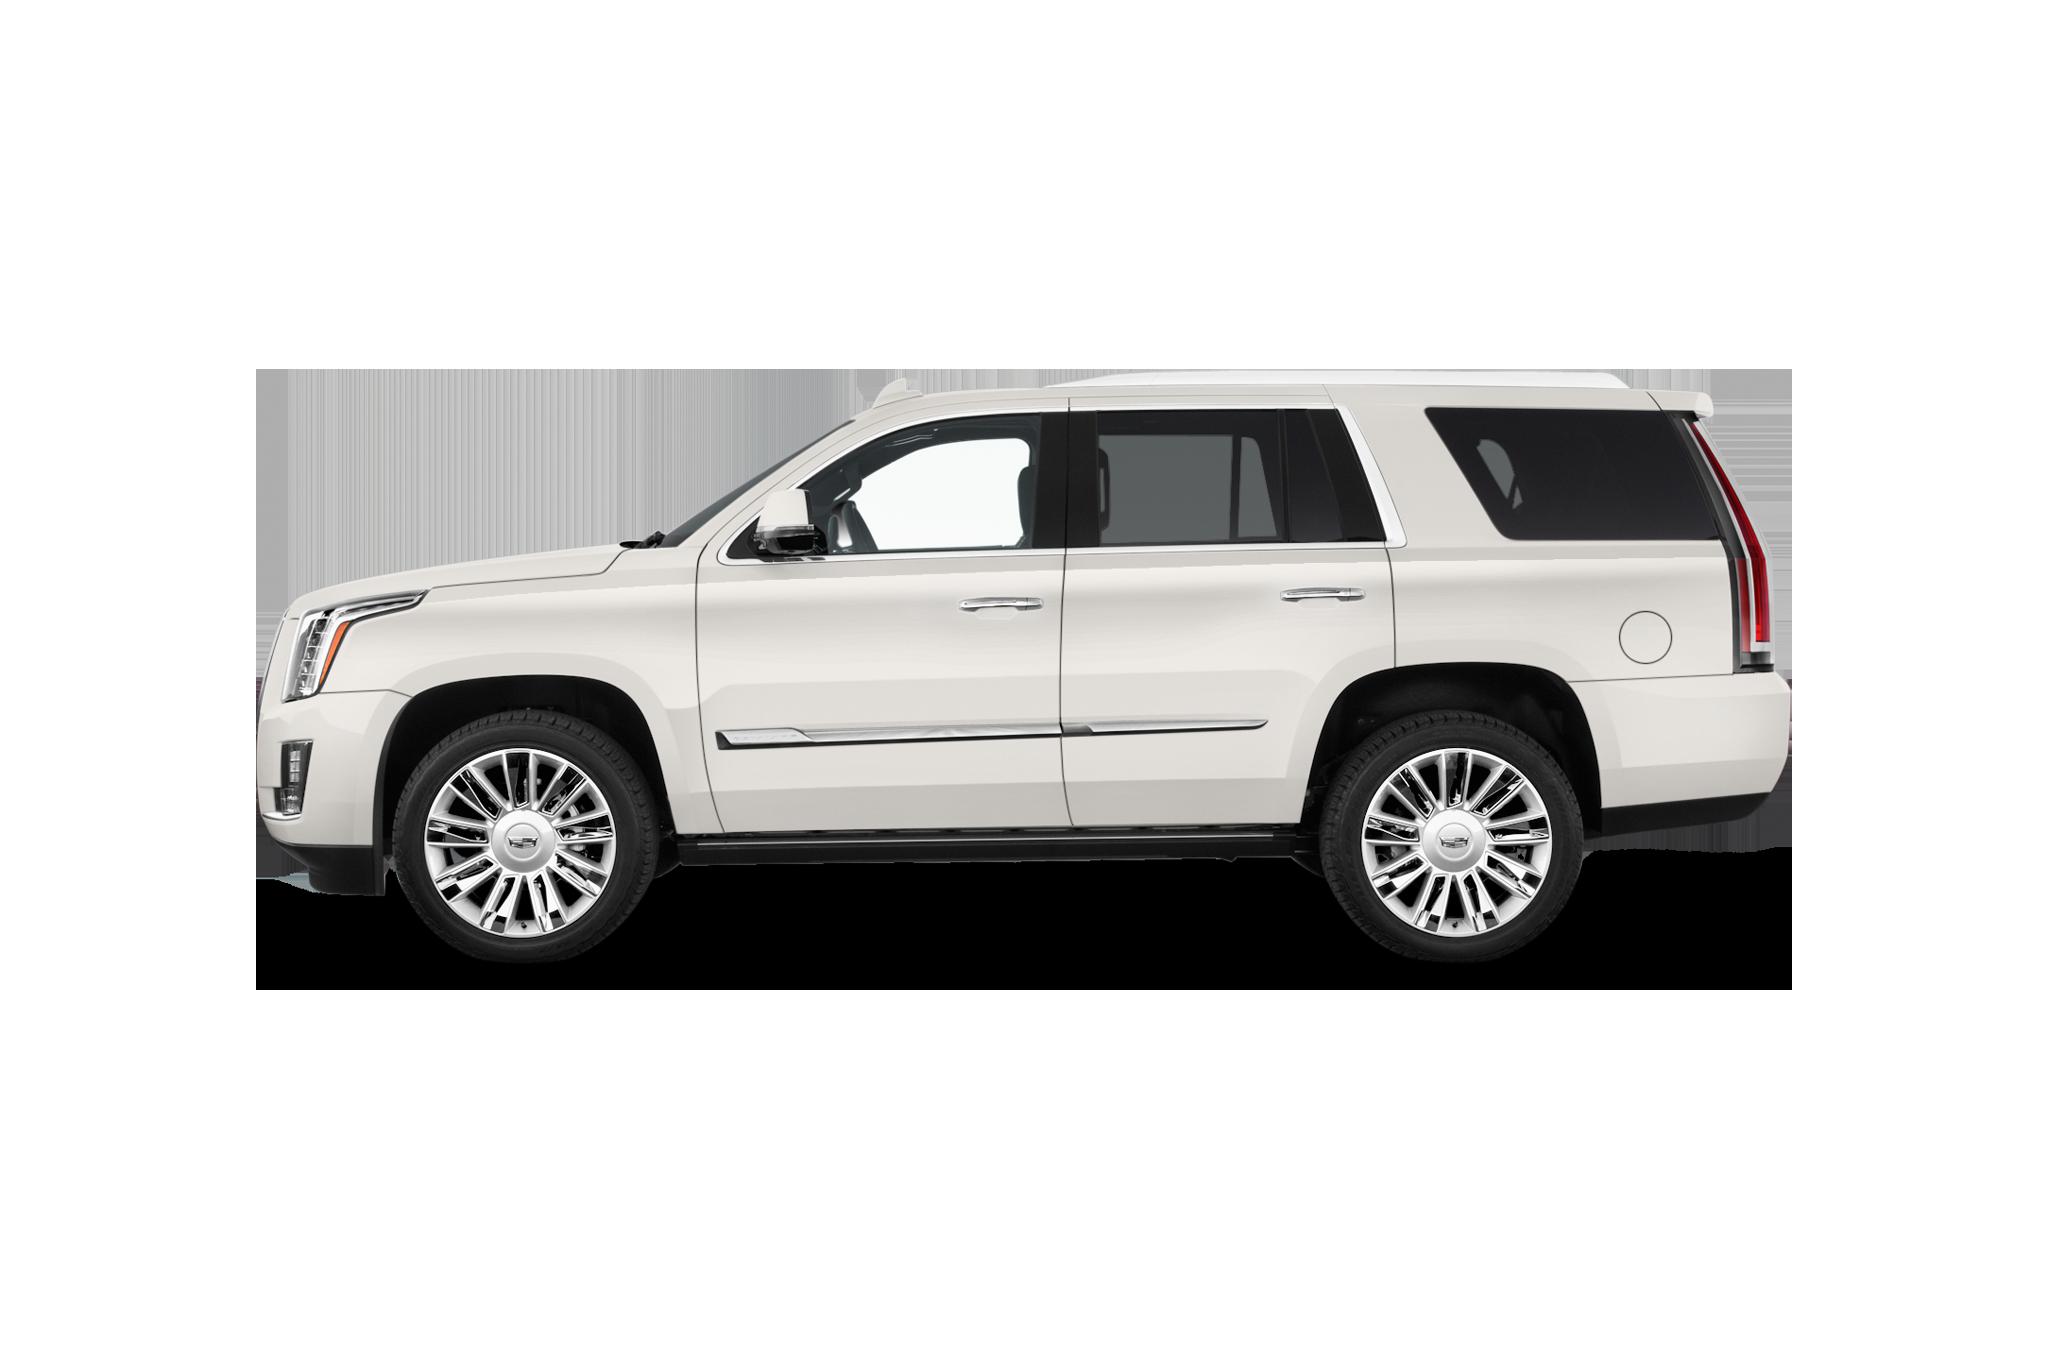 2020 Cadillac Escalade Review, ESV, Specs - 2020 / 2021 ...  2020 Cadillac Escalade